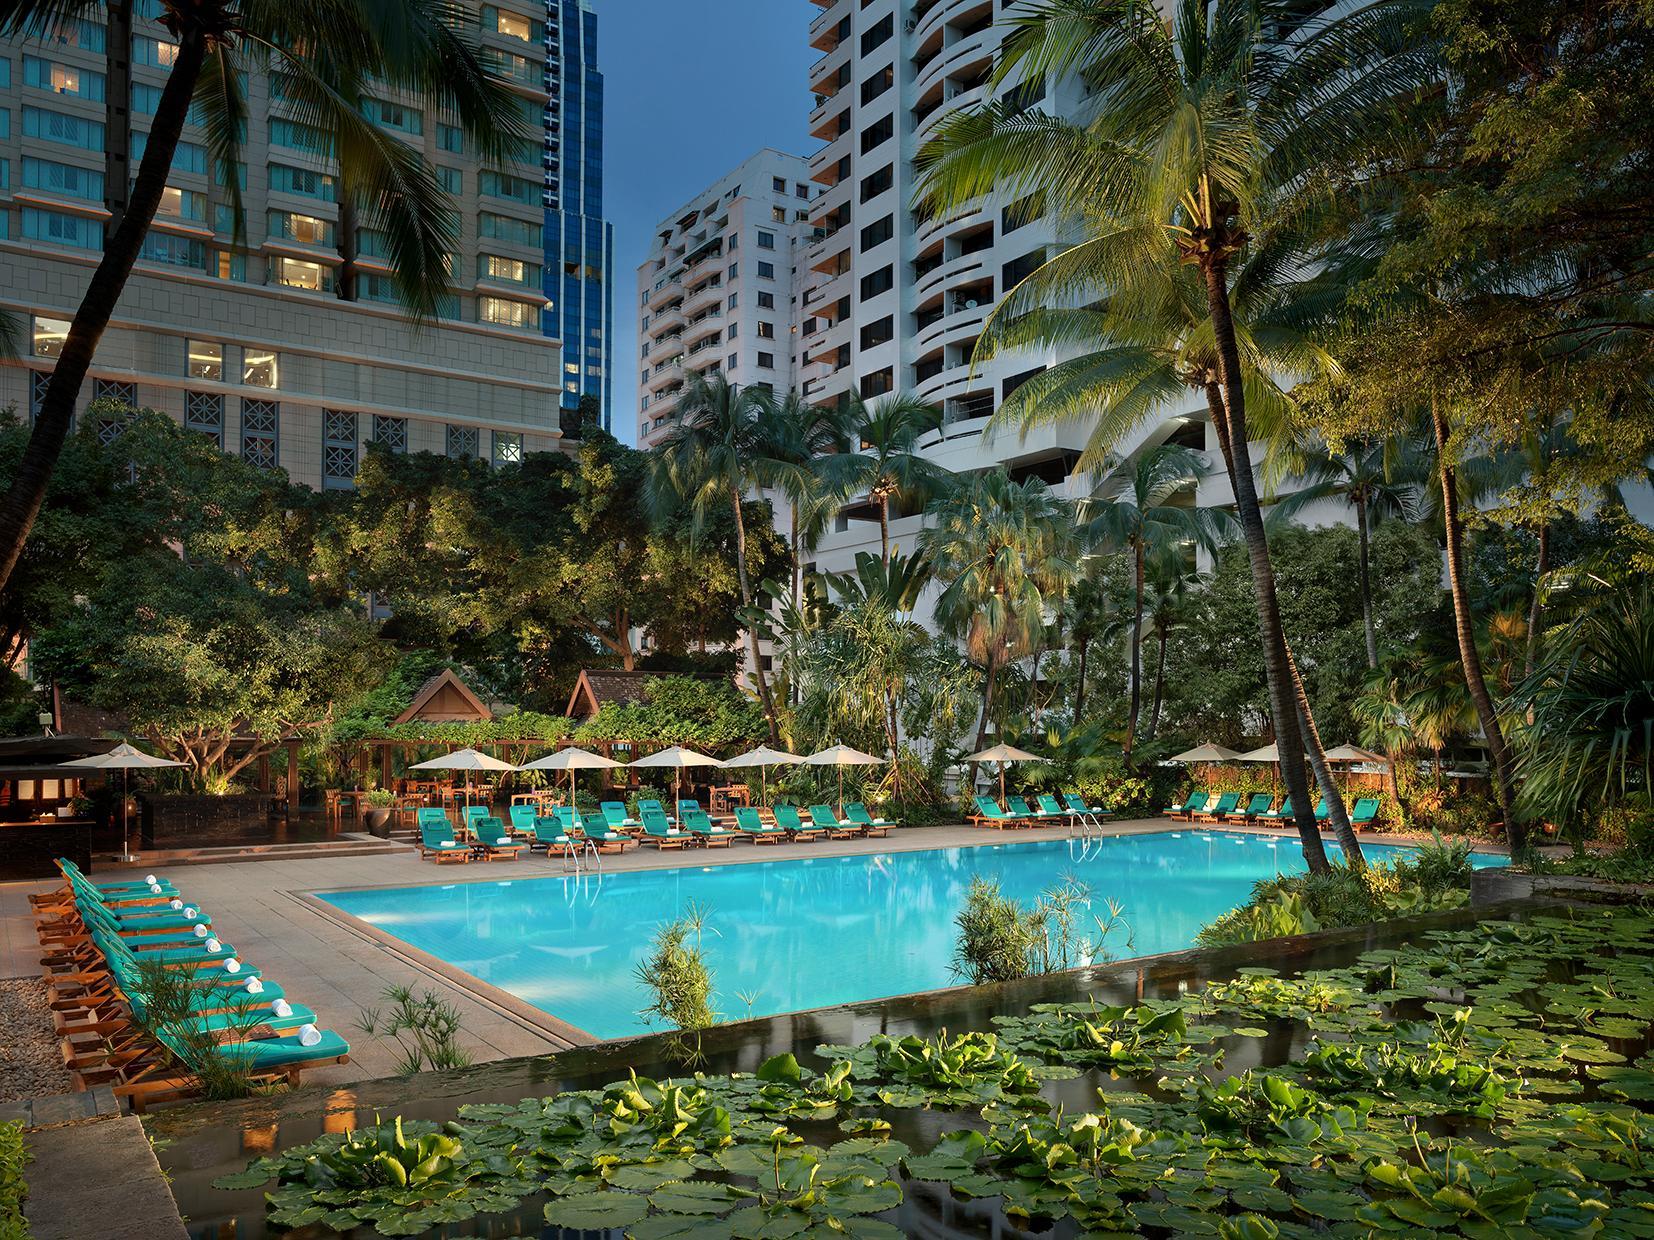 Anantara Siam Bangkok Hotel - Bangkok